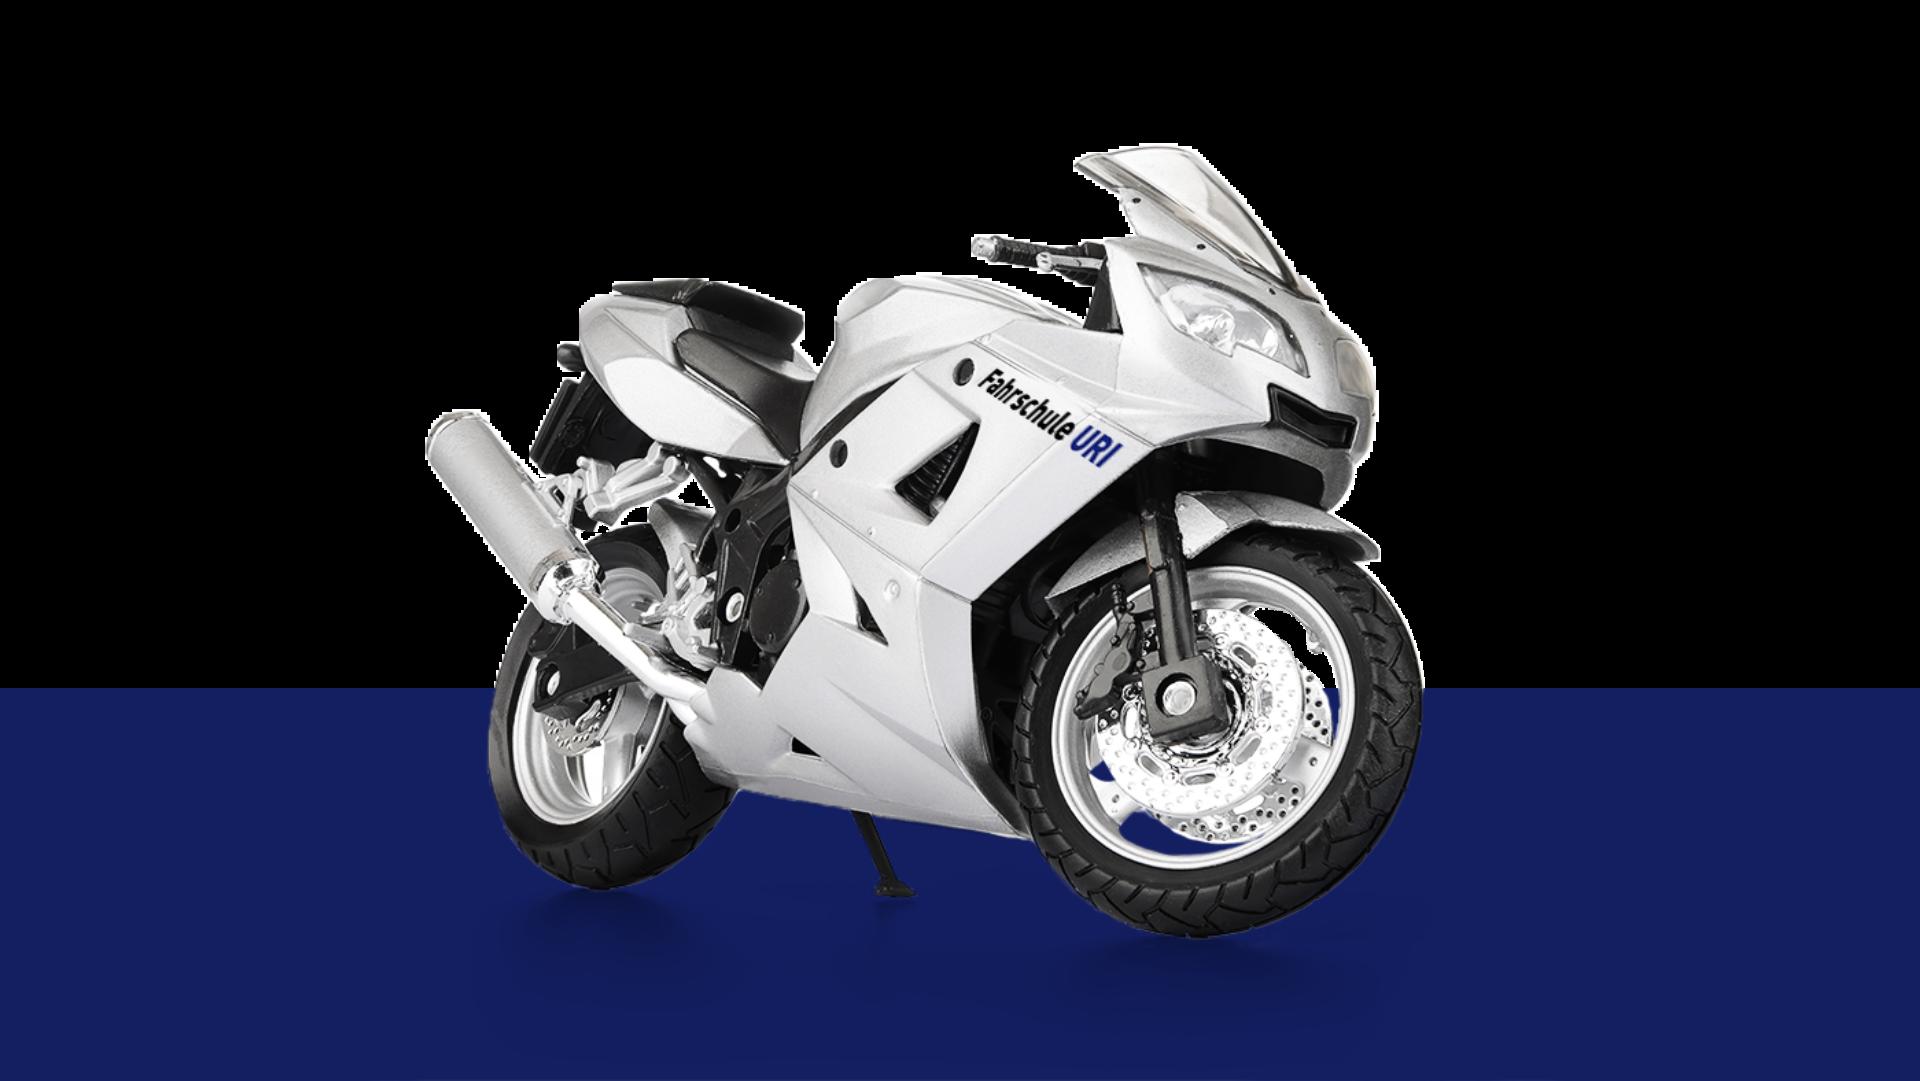 Fahrschule Uri 2020 Startbilder Motorrad